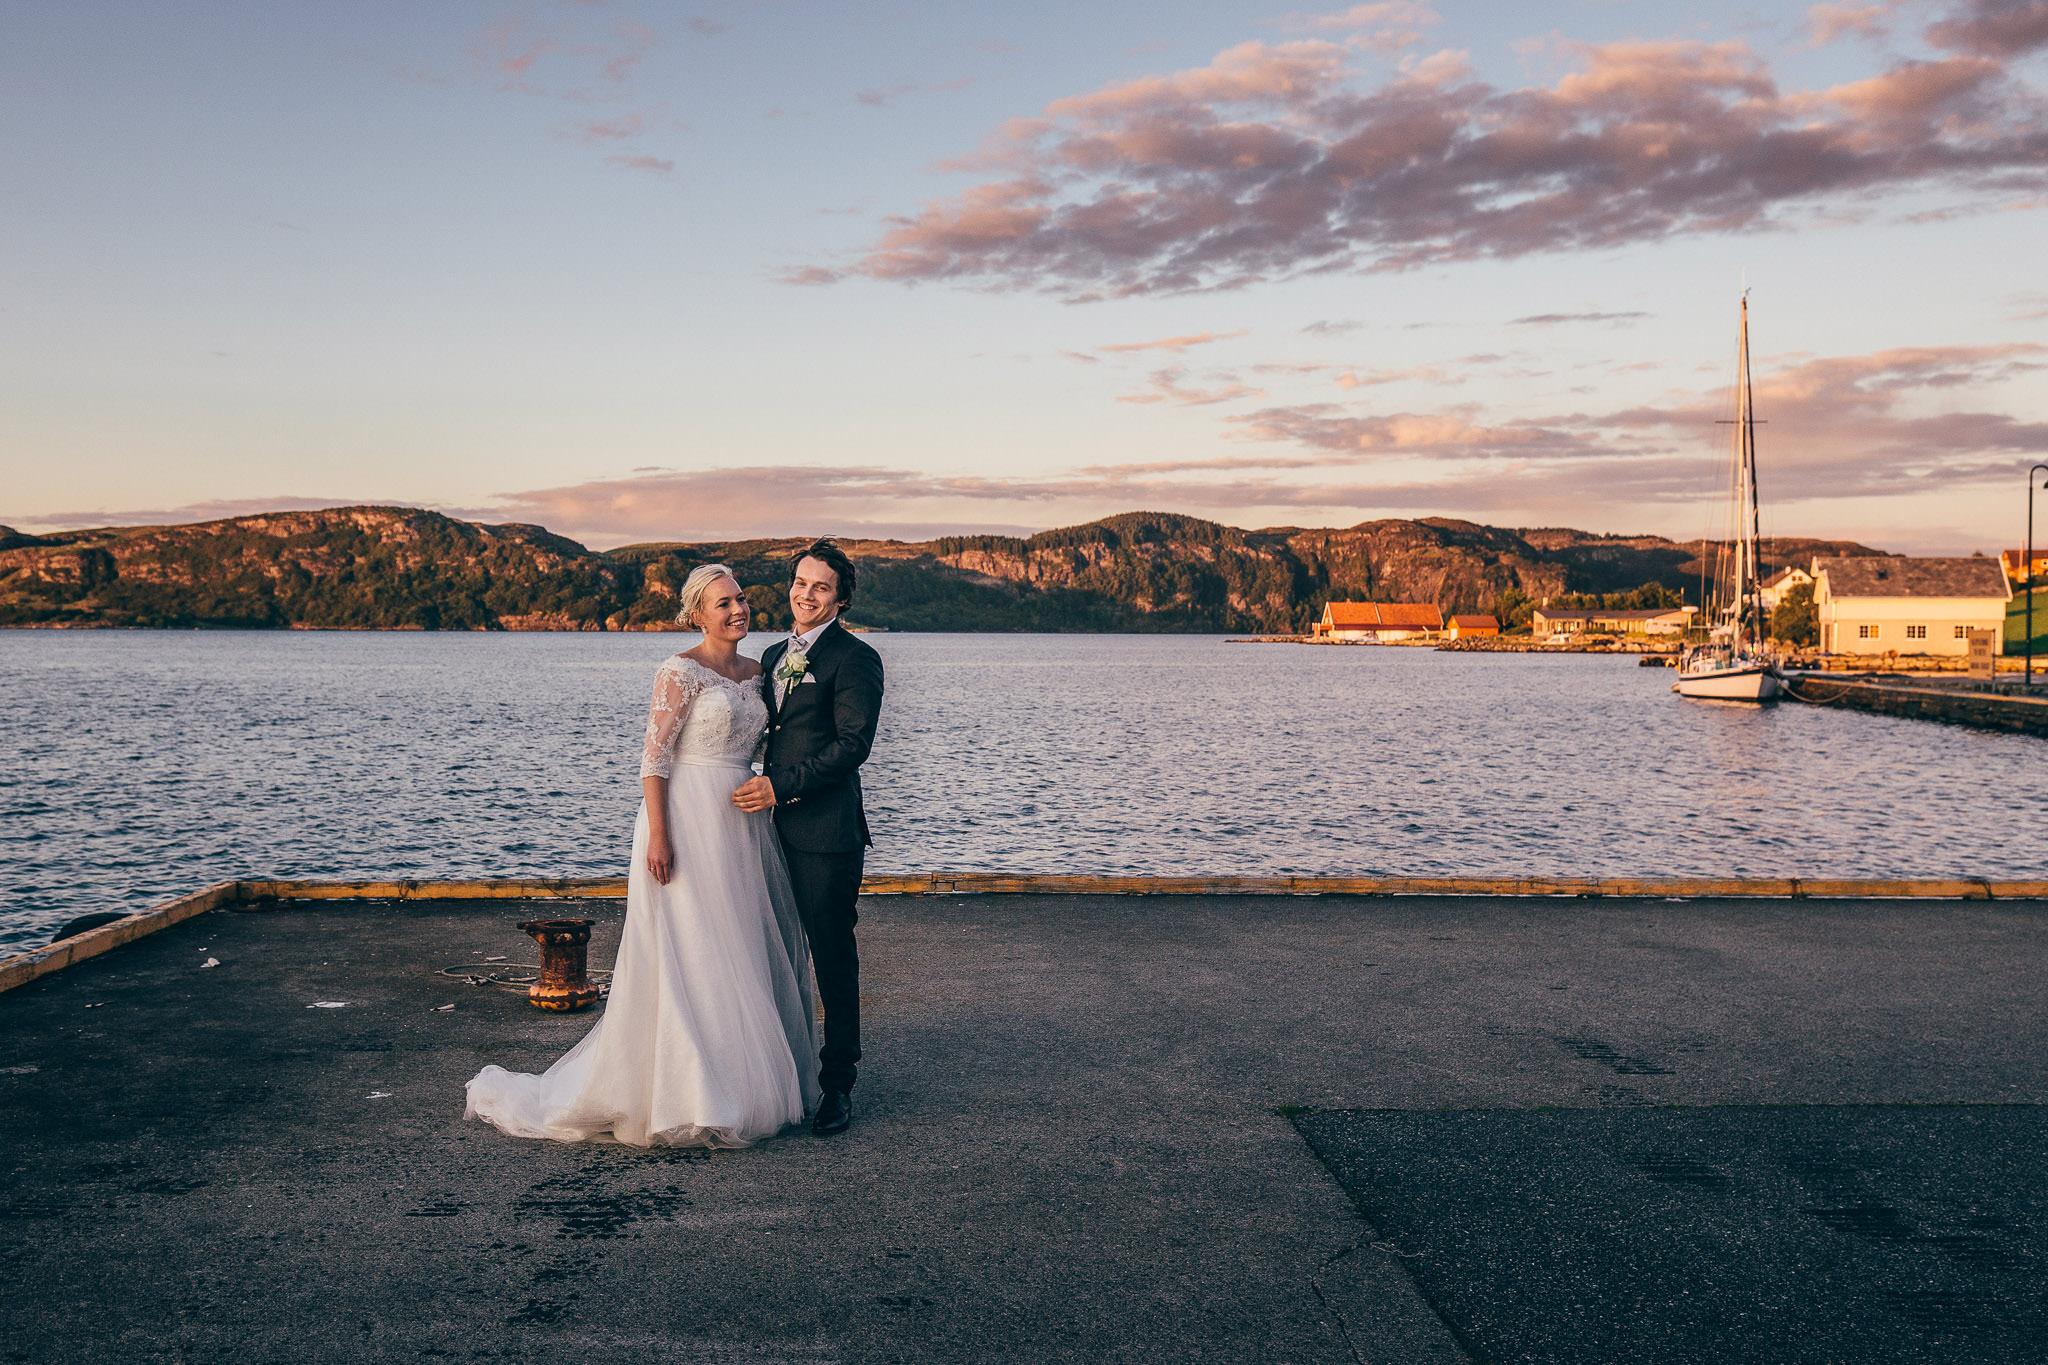 Wedding+Photographer+Norway+Bryllupsfotograf+Casey+Arneson+JT-178.jpg